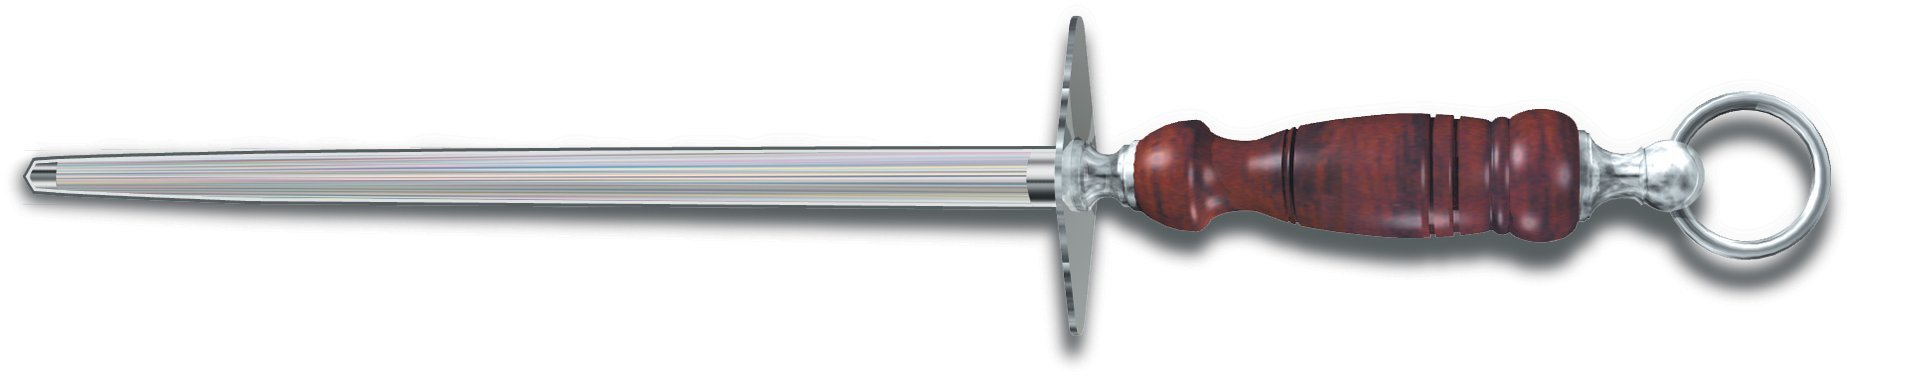 Victorinox Honing Steel 10-Inch Round Regular Cut, Dark Wood Handle